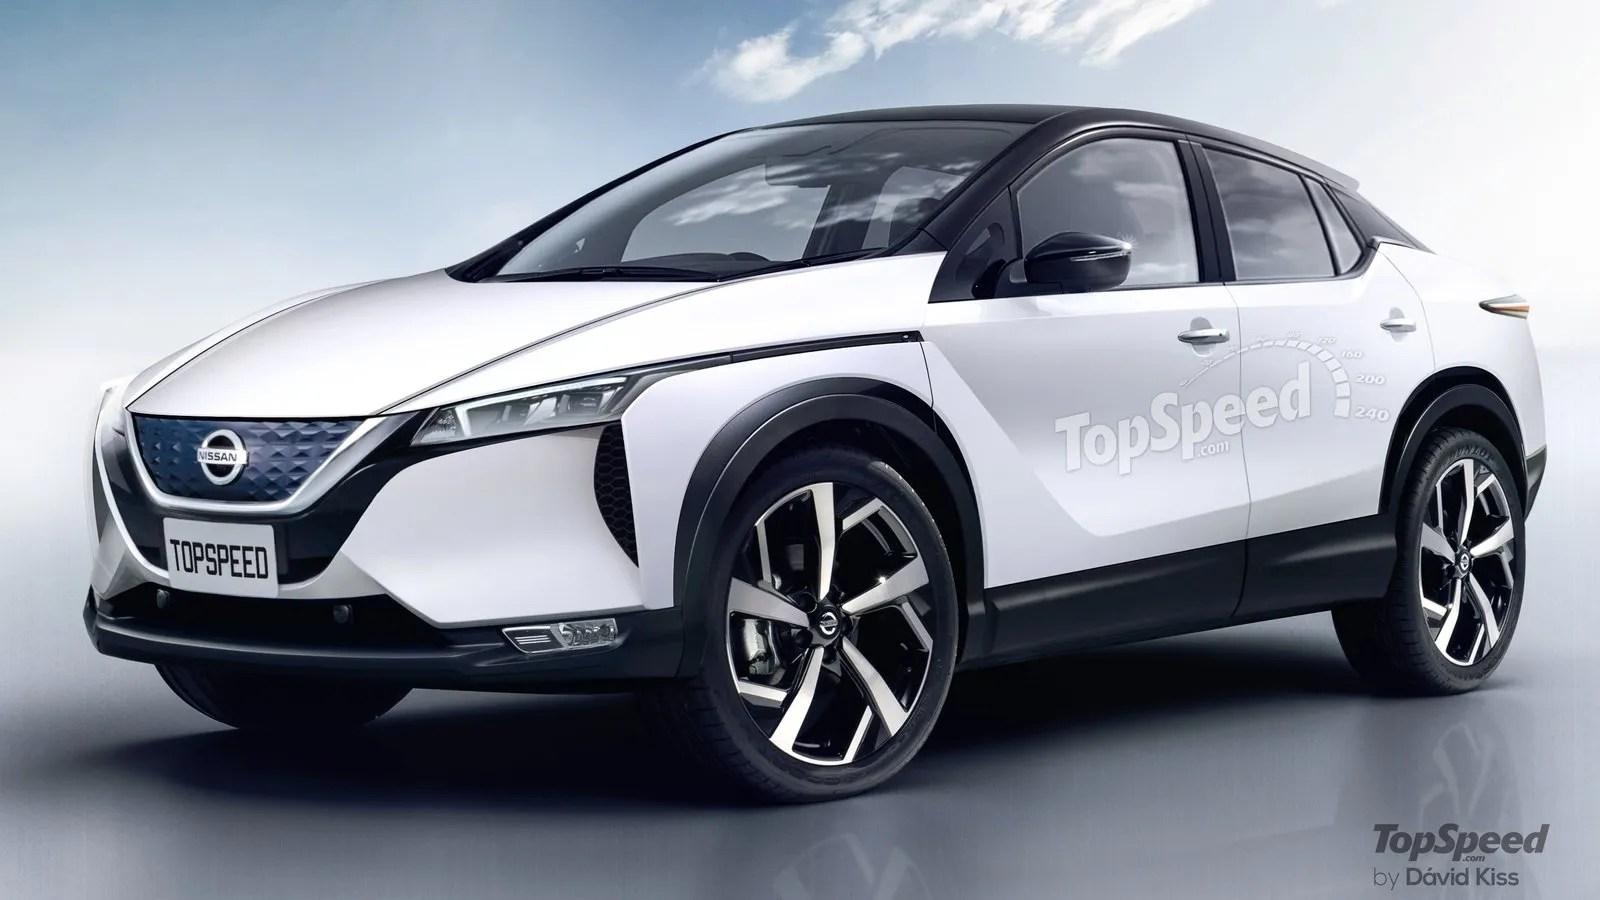 2020 Nissan Imx Top Speed